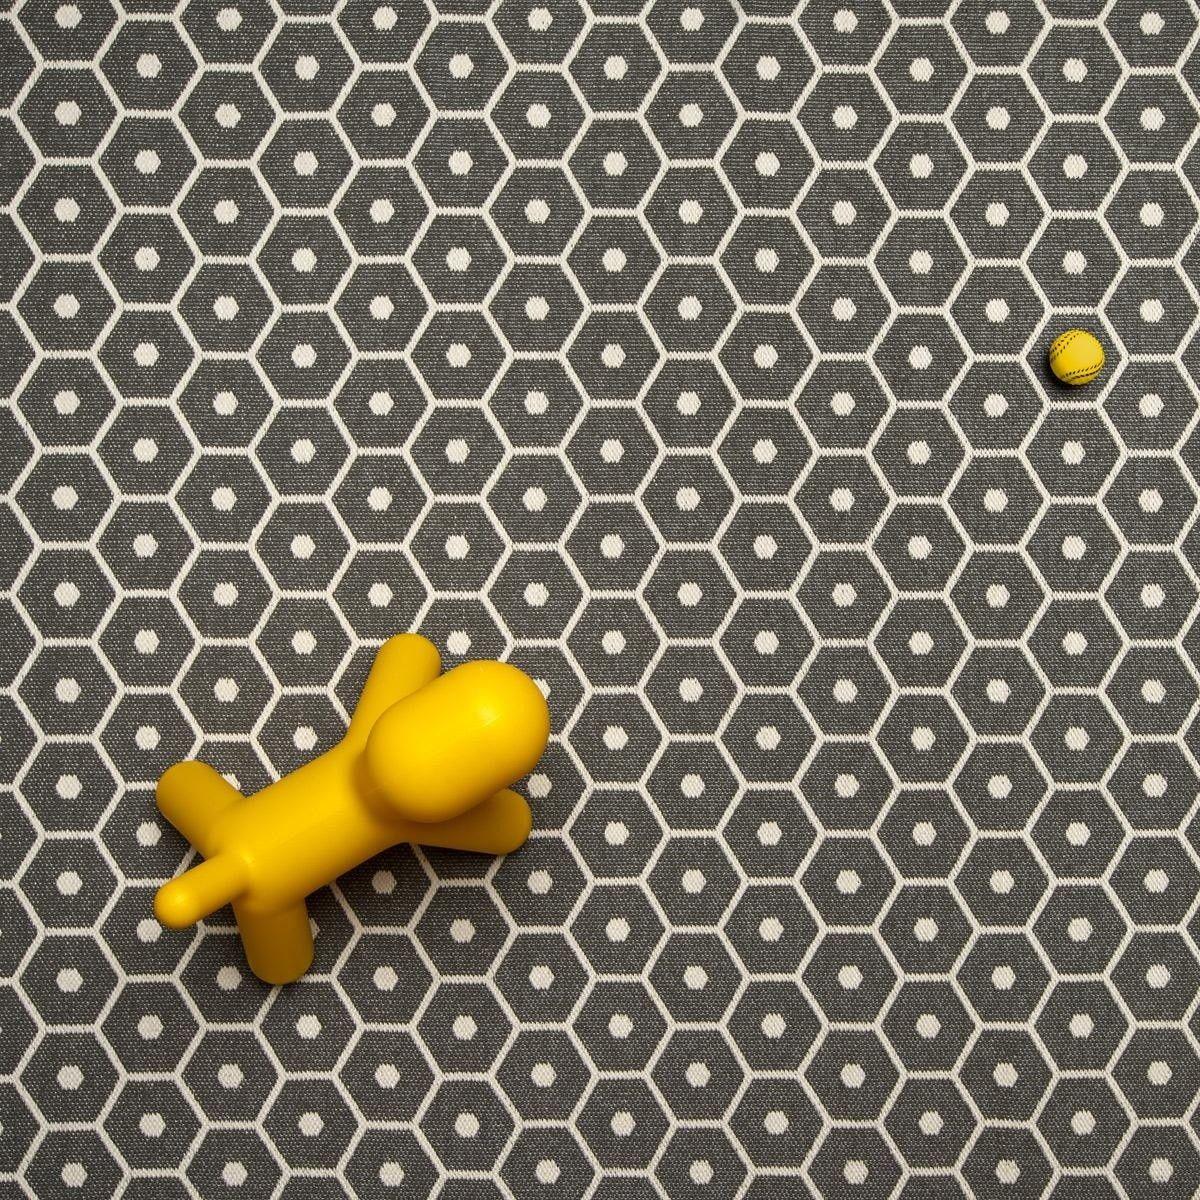 honey teppich 70x100cm pappelina. Black Bedroom Furniture Sets. Home Design Ideas